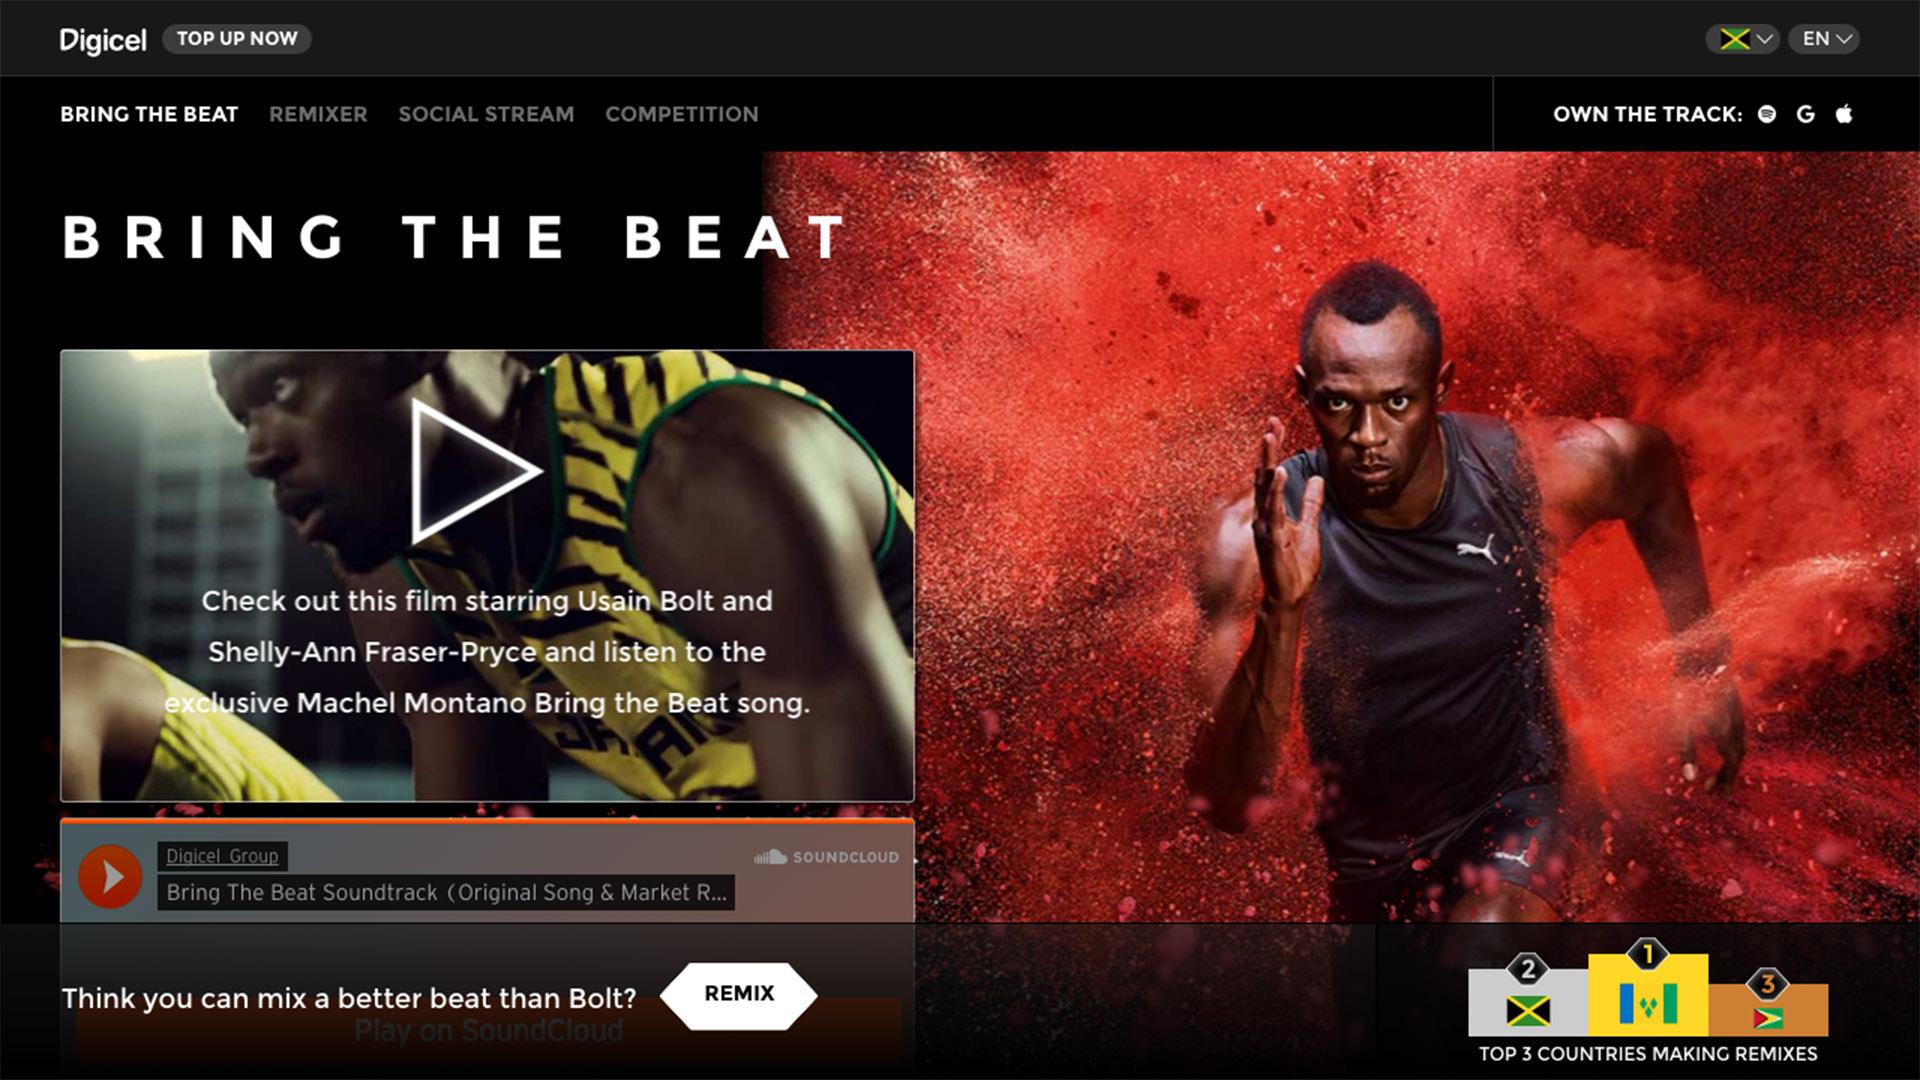 bringthebeat-remixer6